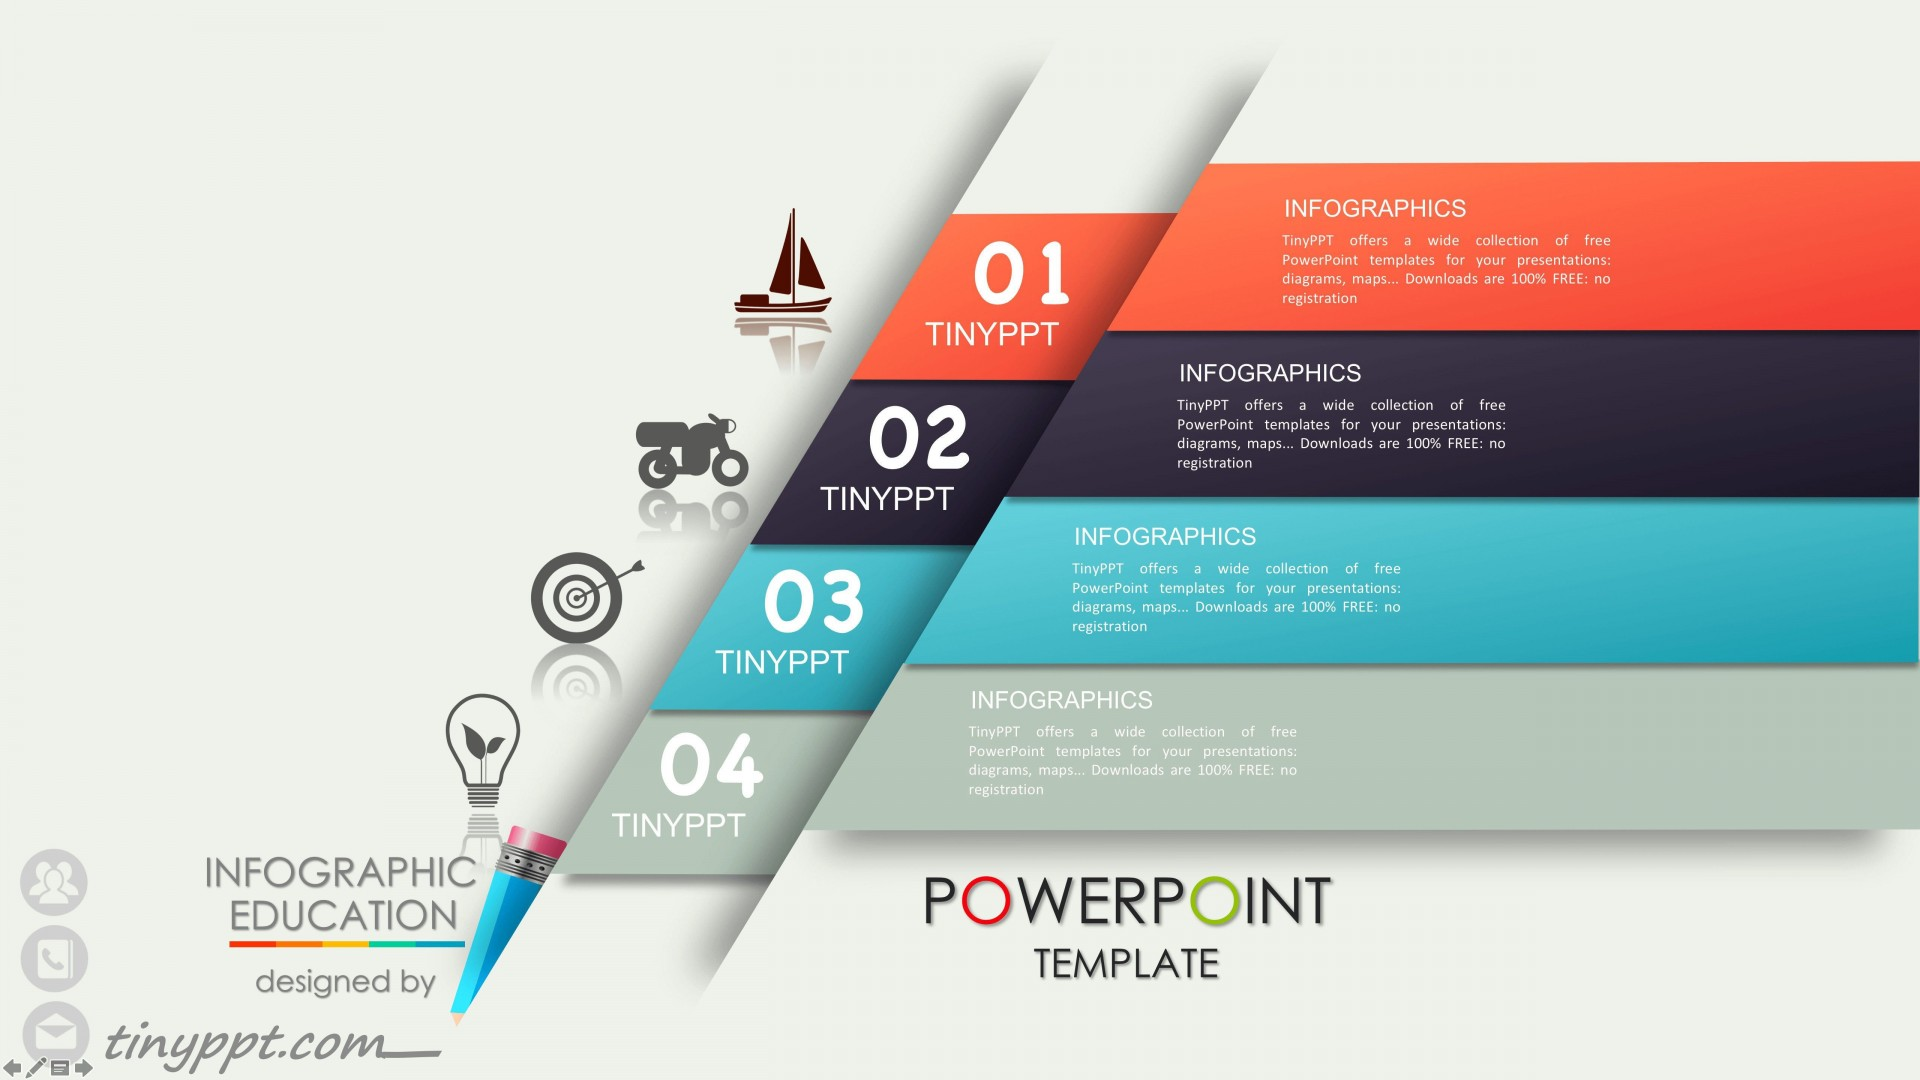 001 Remarkable Free Download Busines Proposal Template Ppt High Def  Best Plan Sample Plan.ppt 20201920